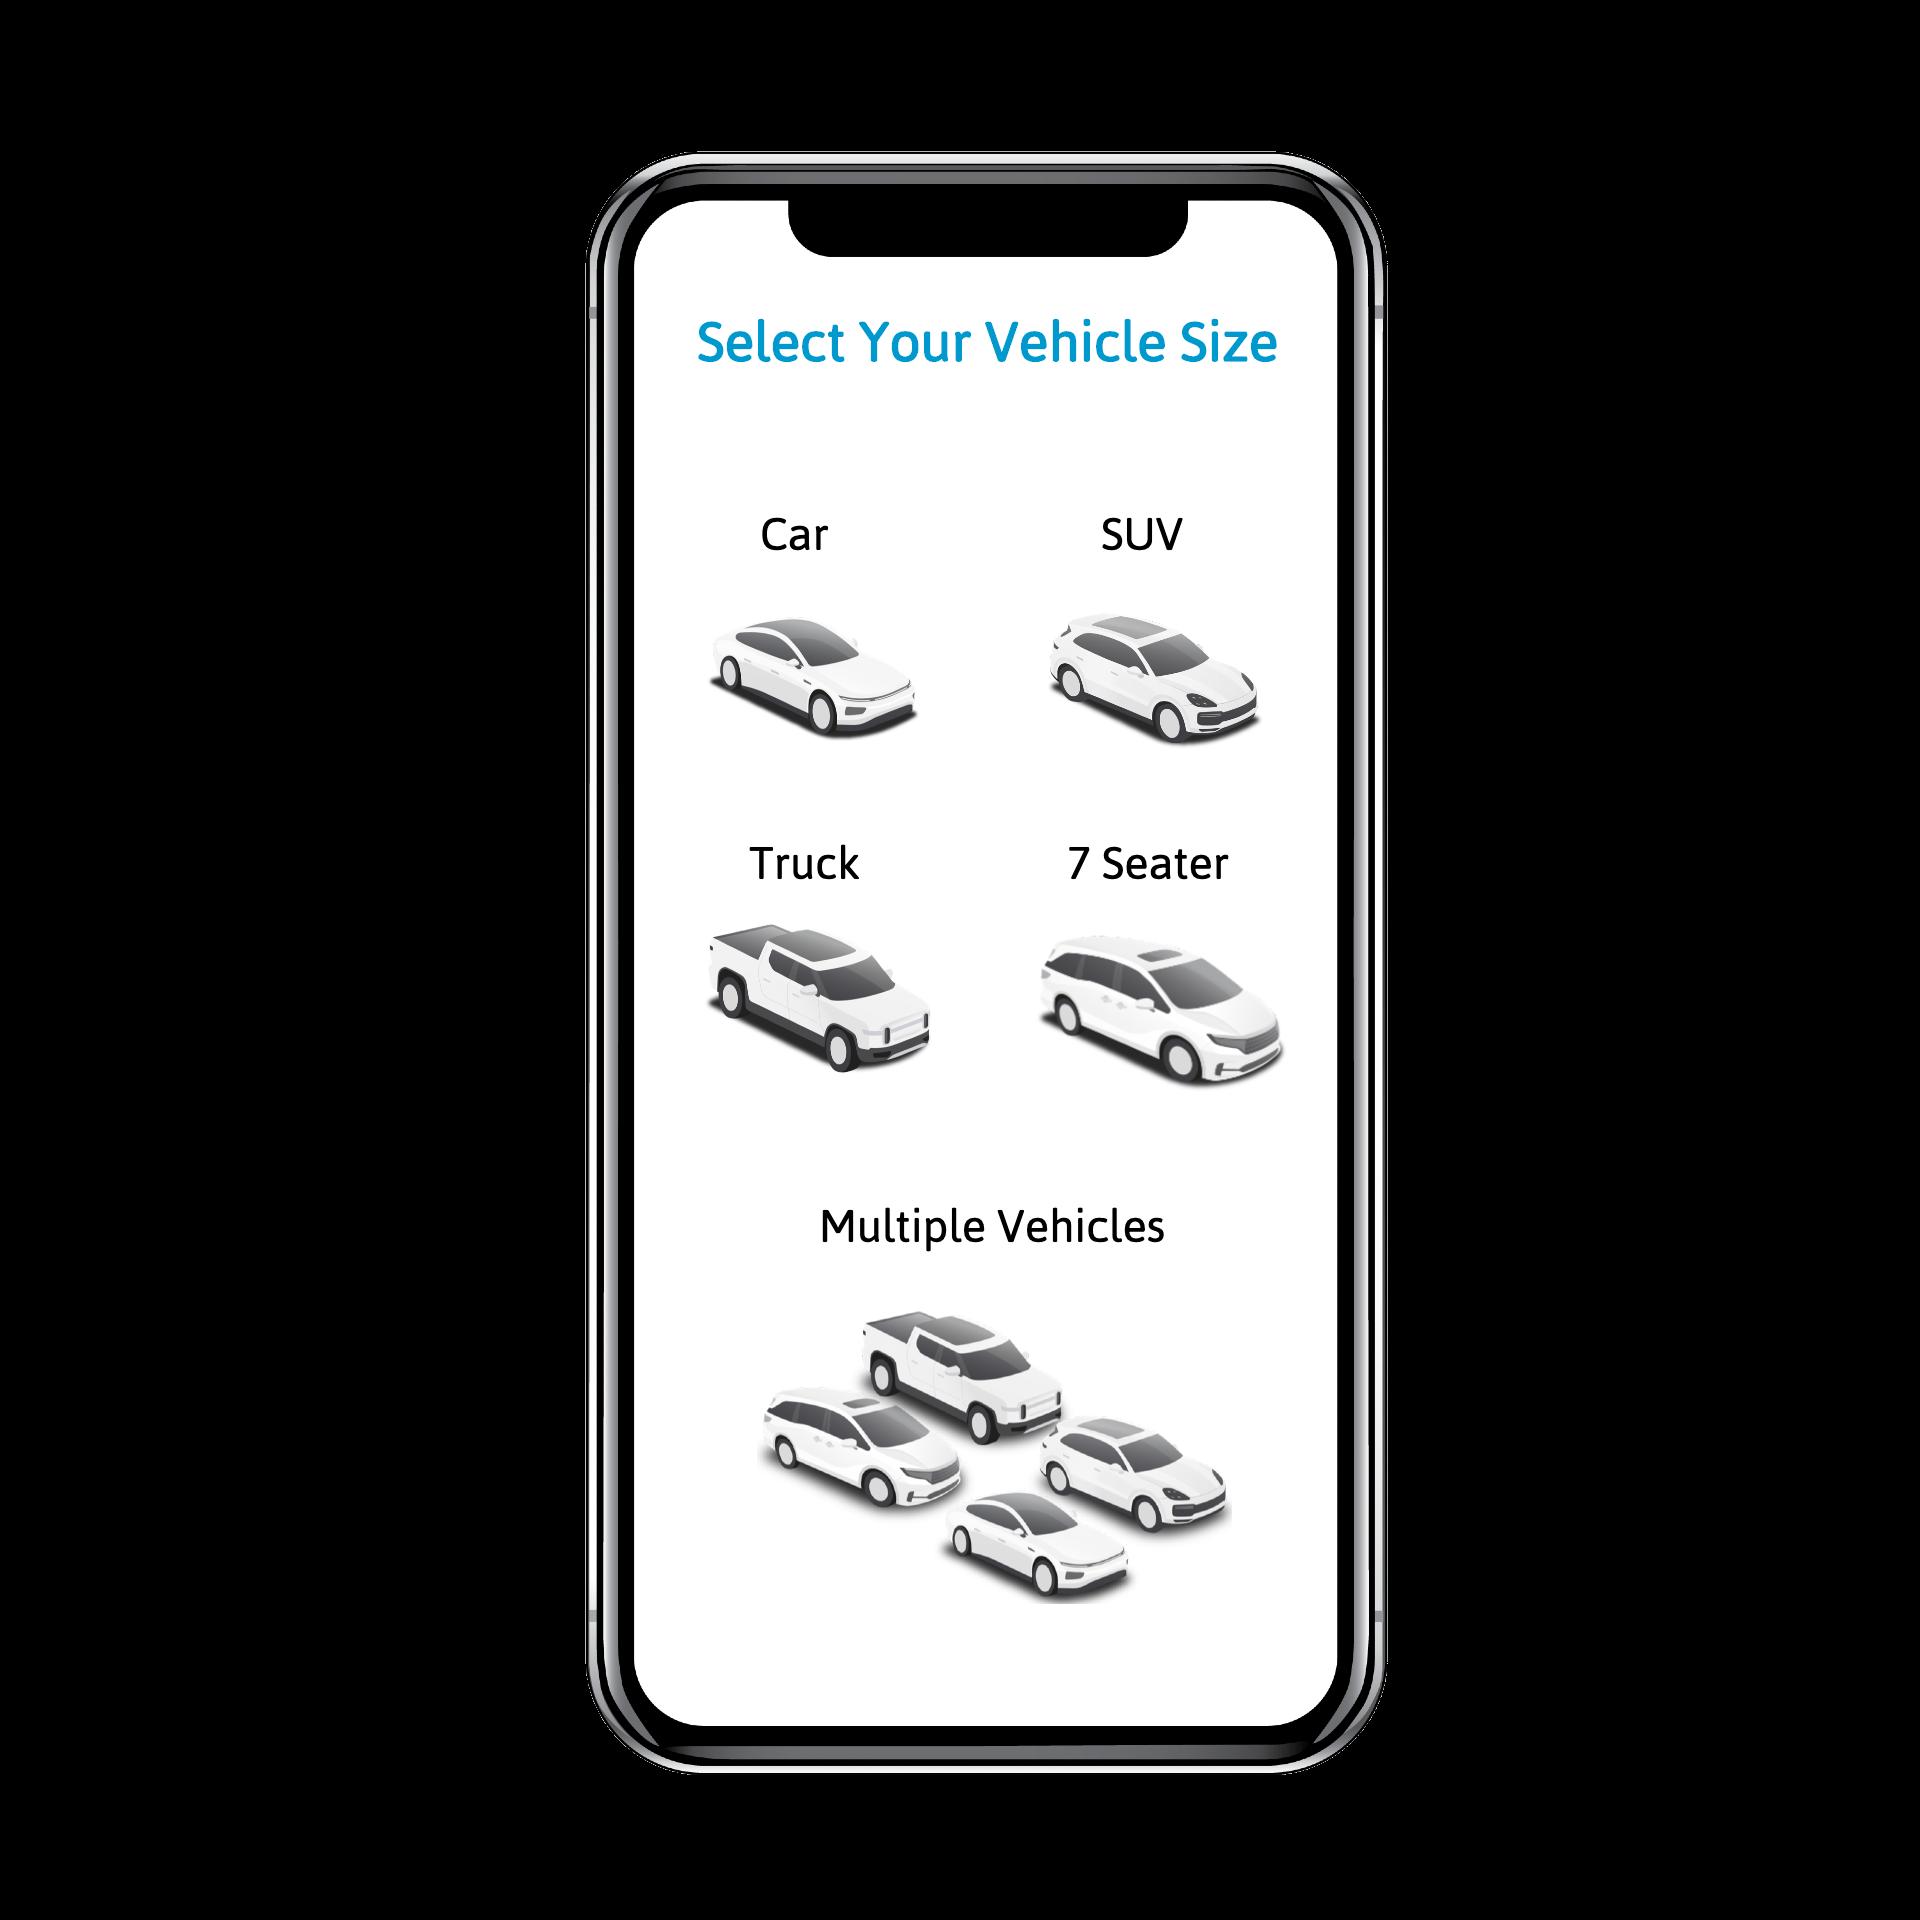 Innovative vehicle selection